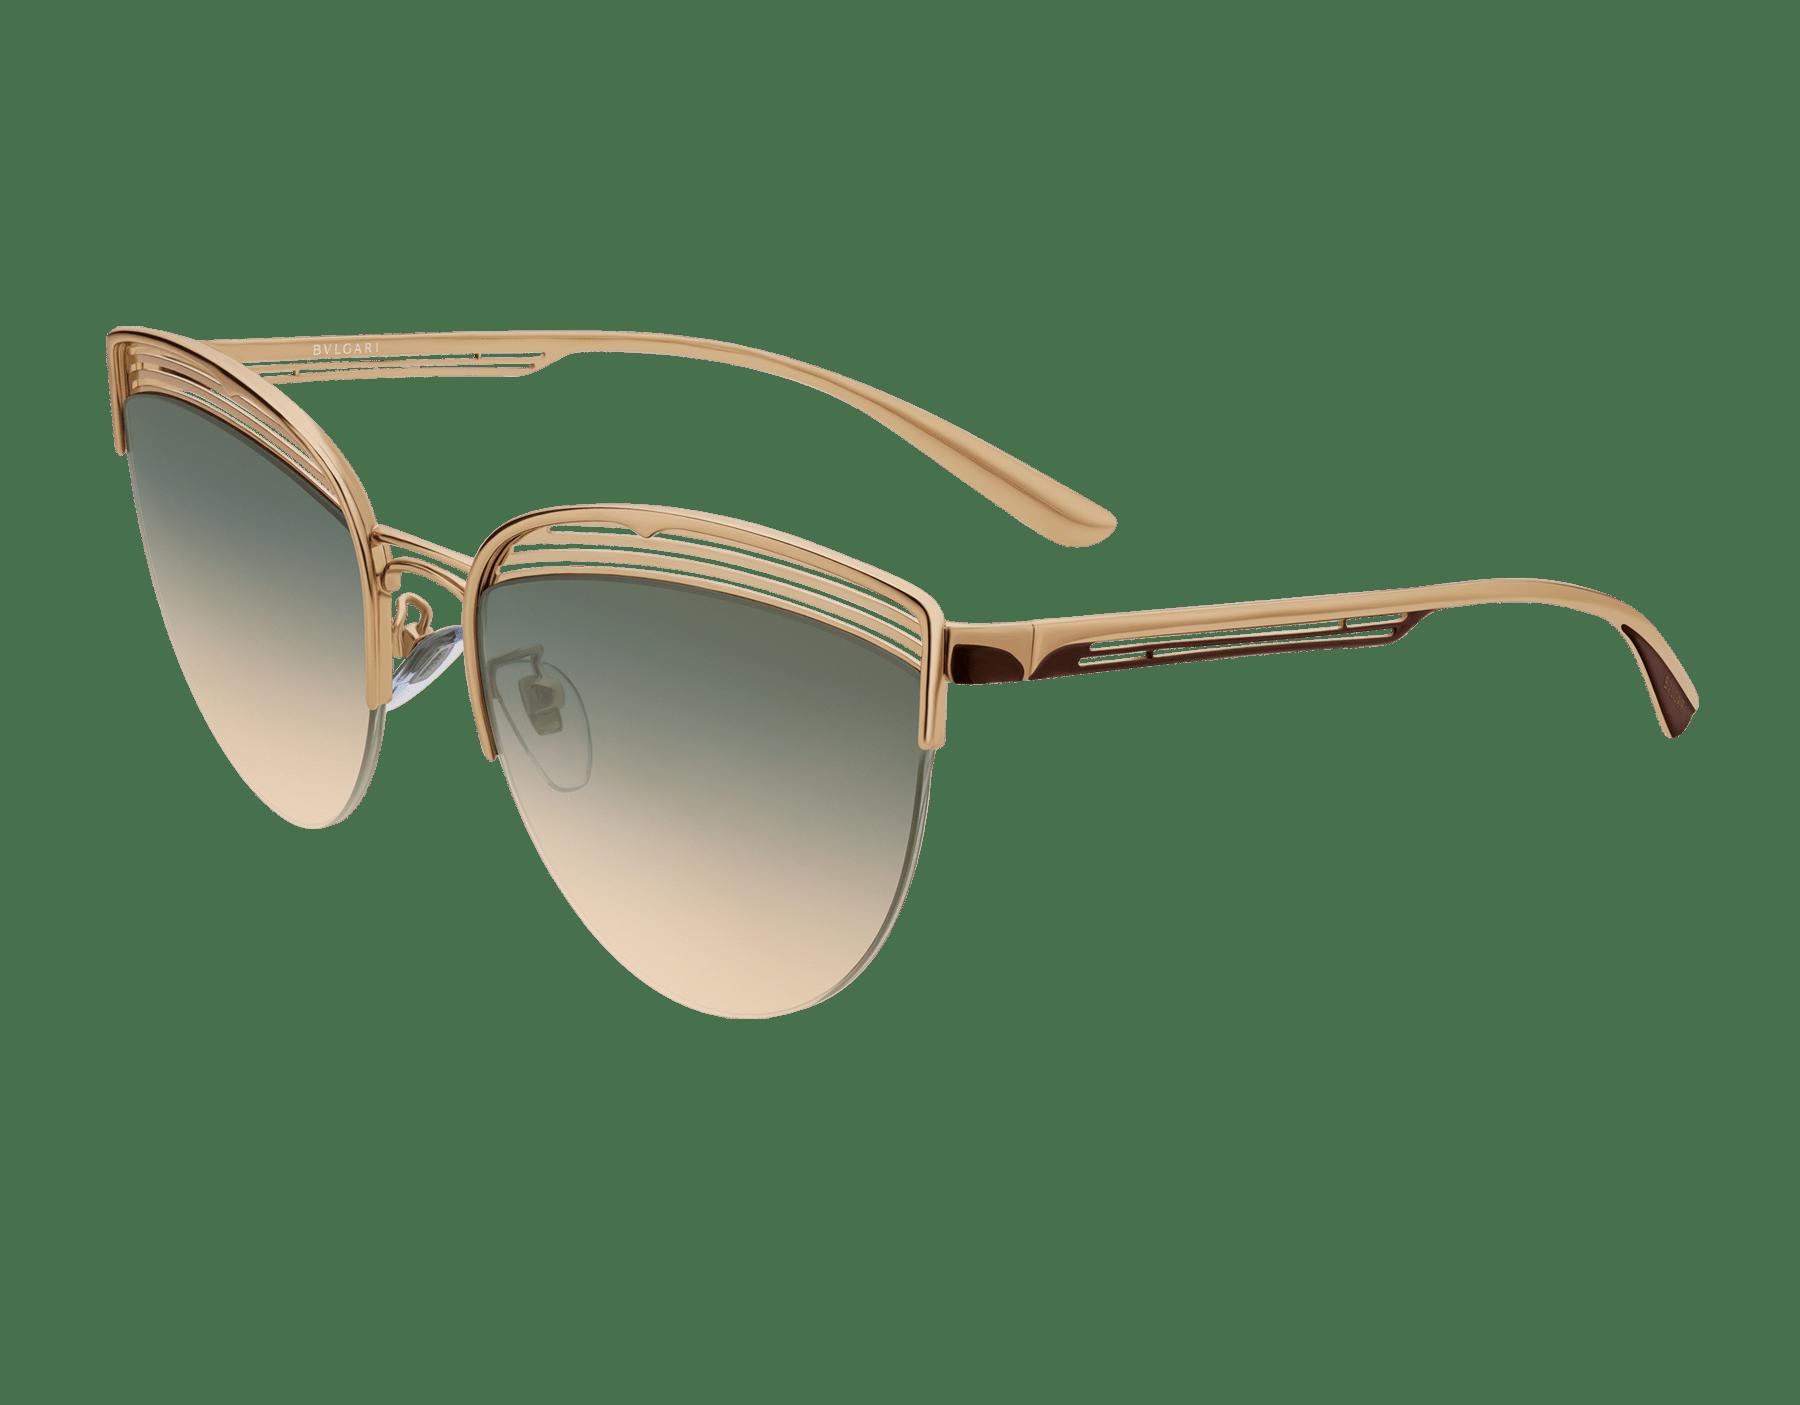 Gafas de sol Bvlgari B.zero1 B.purevibes de ojo de gato con semiarmazón en metal. 903895 image 1